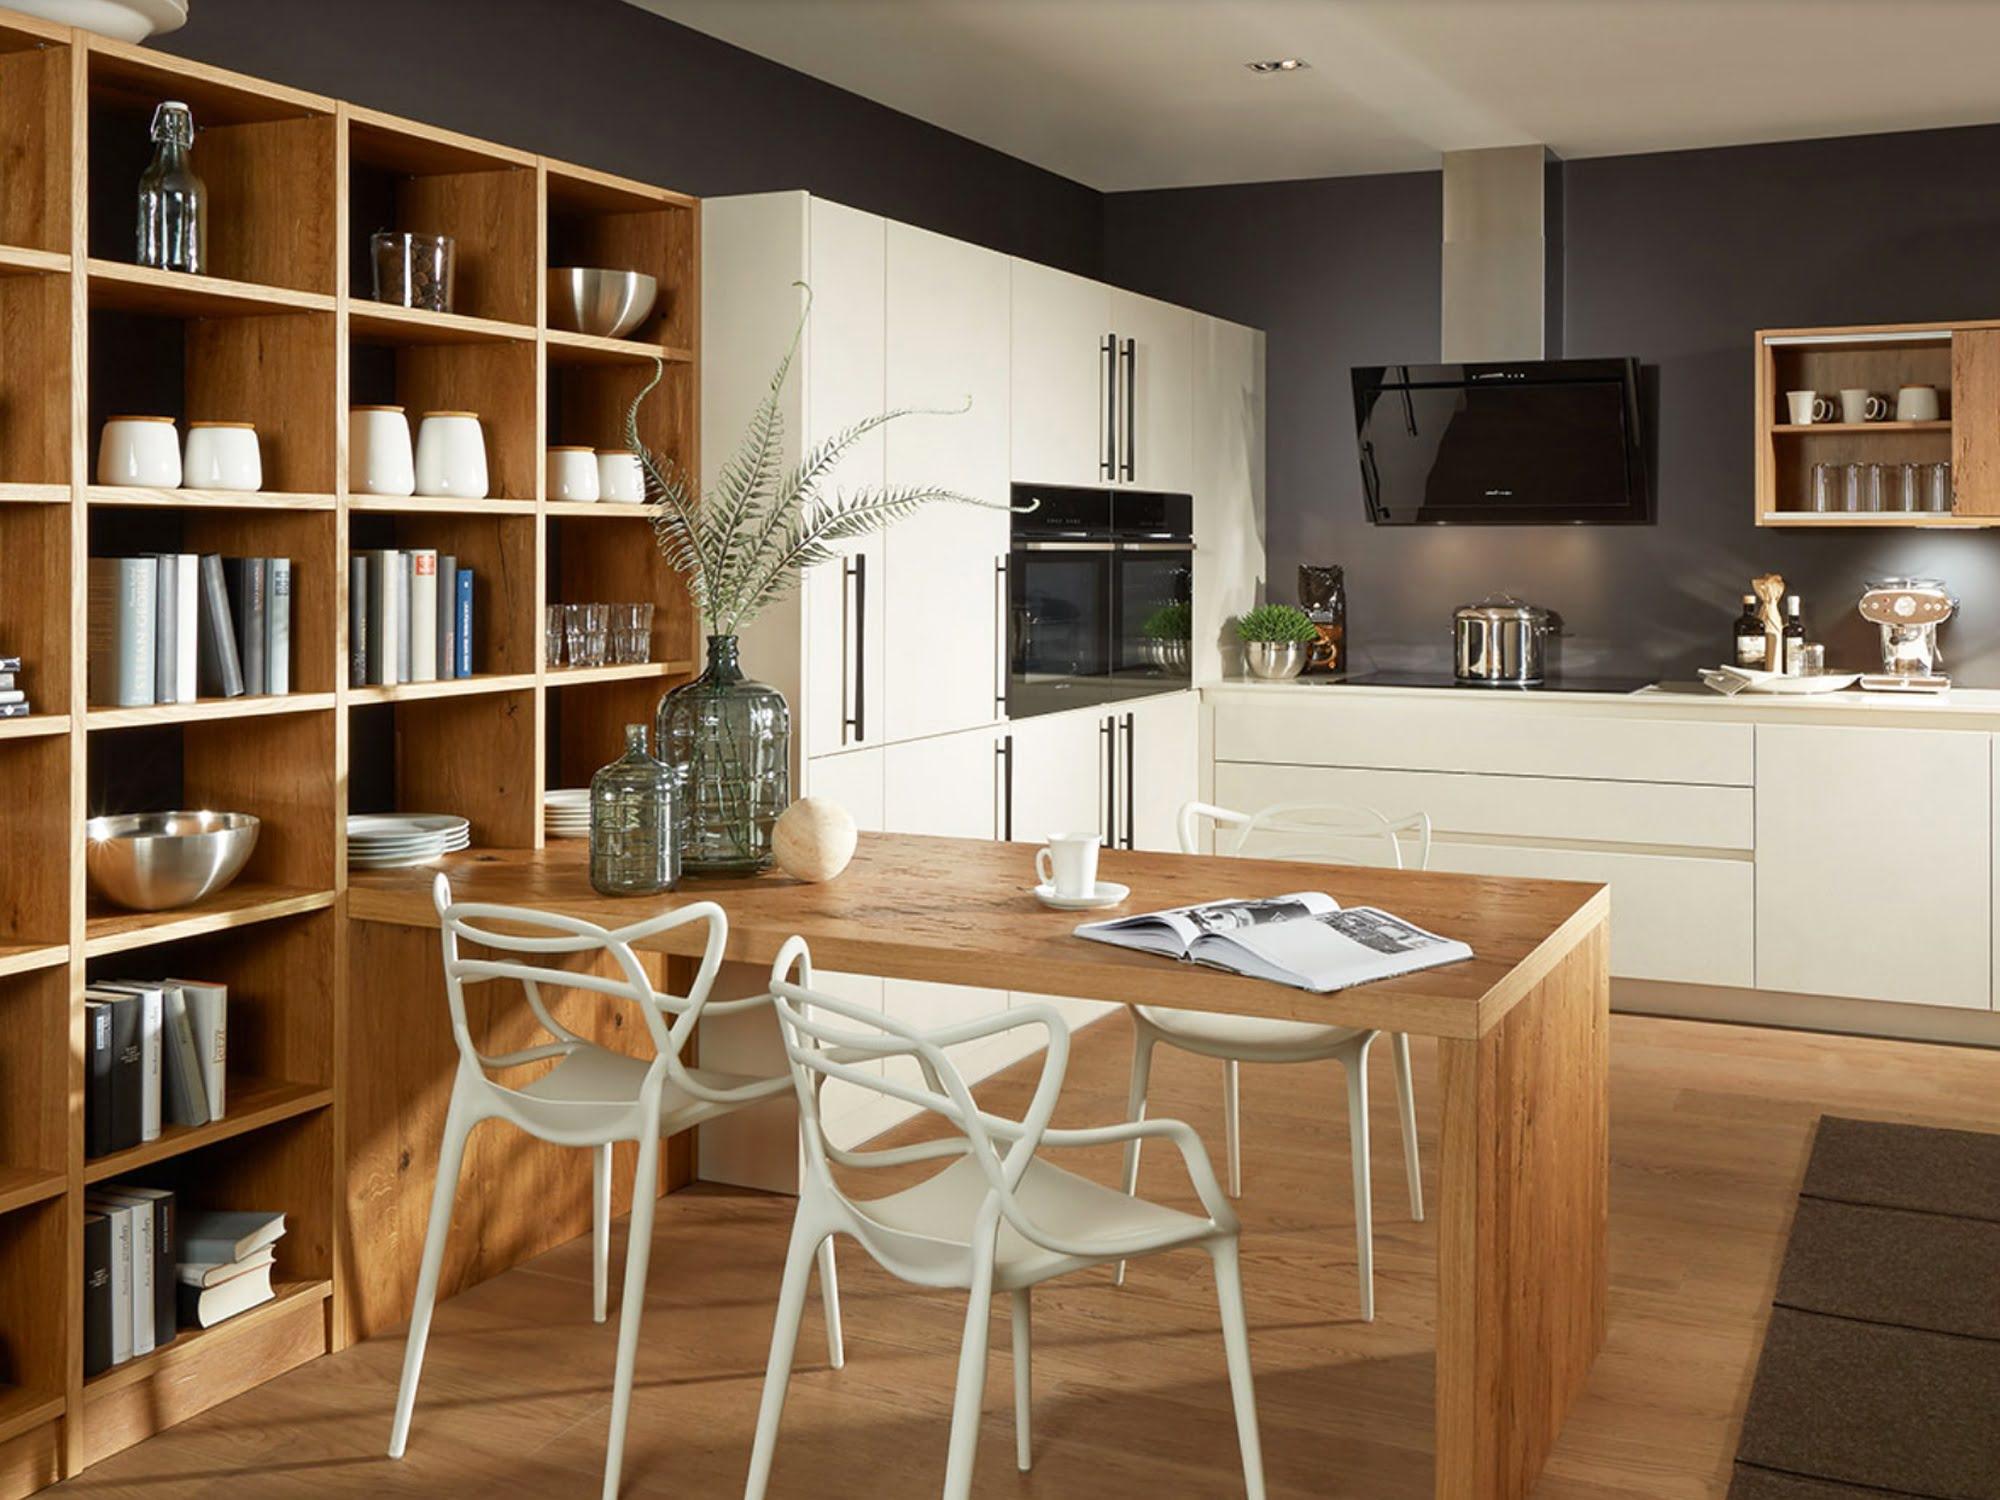 cuisine beeck kutchen particulier ls studio architecte intérieur vannes